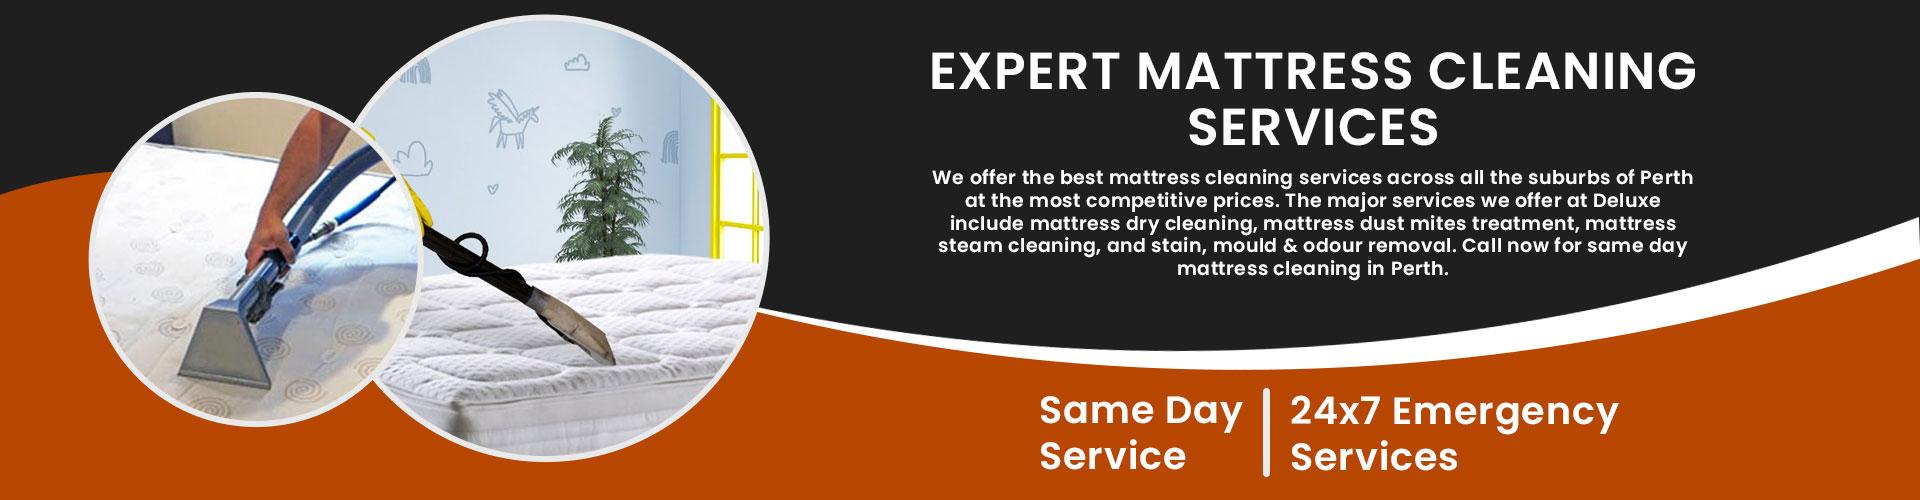 Expert Mattress Cleaning Services